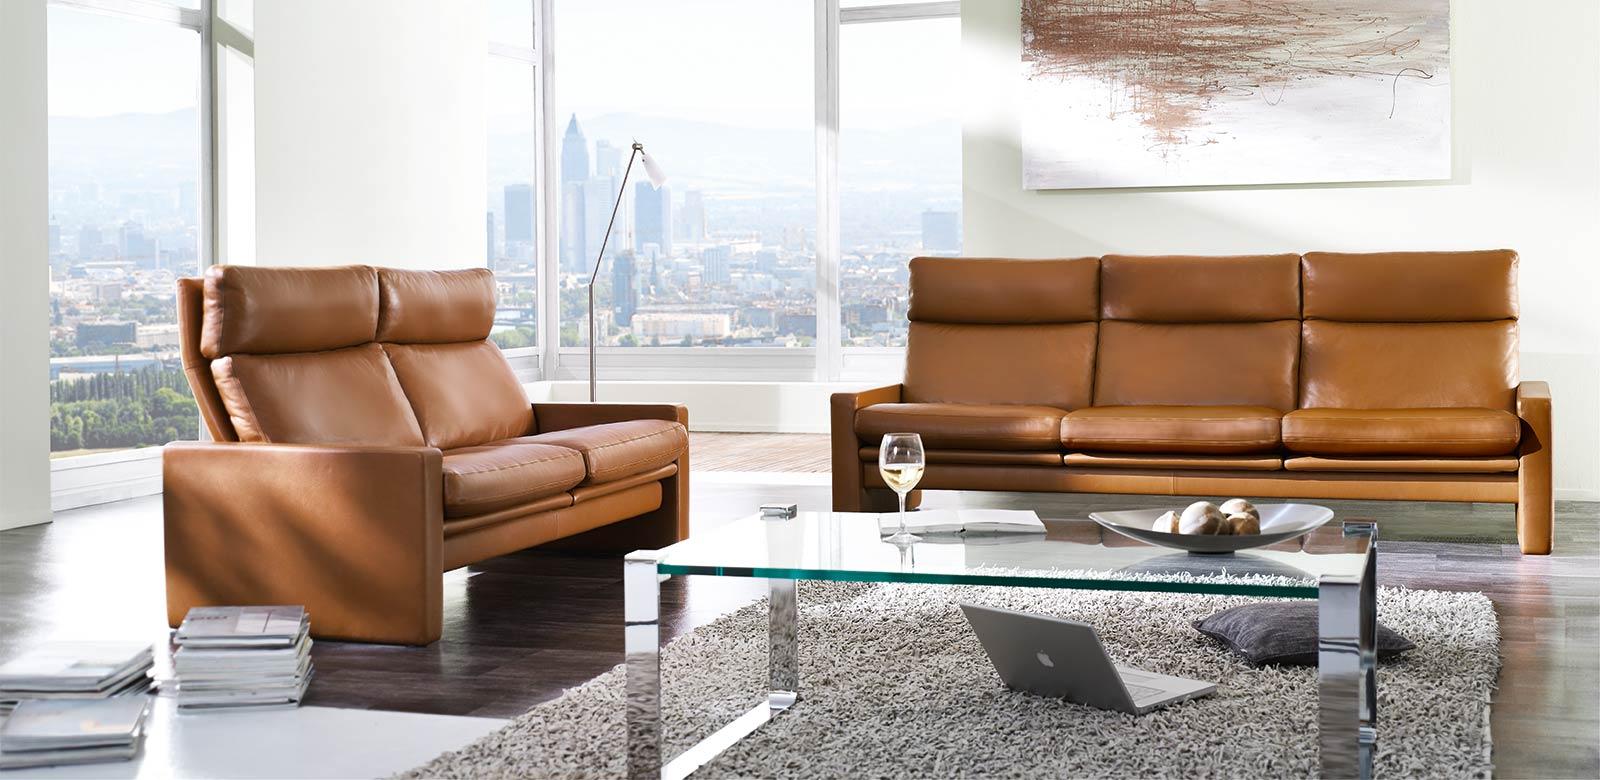 ERPO Designsofa Manhattan - hochwertige Leder Sofas